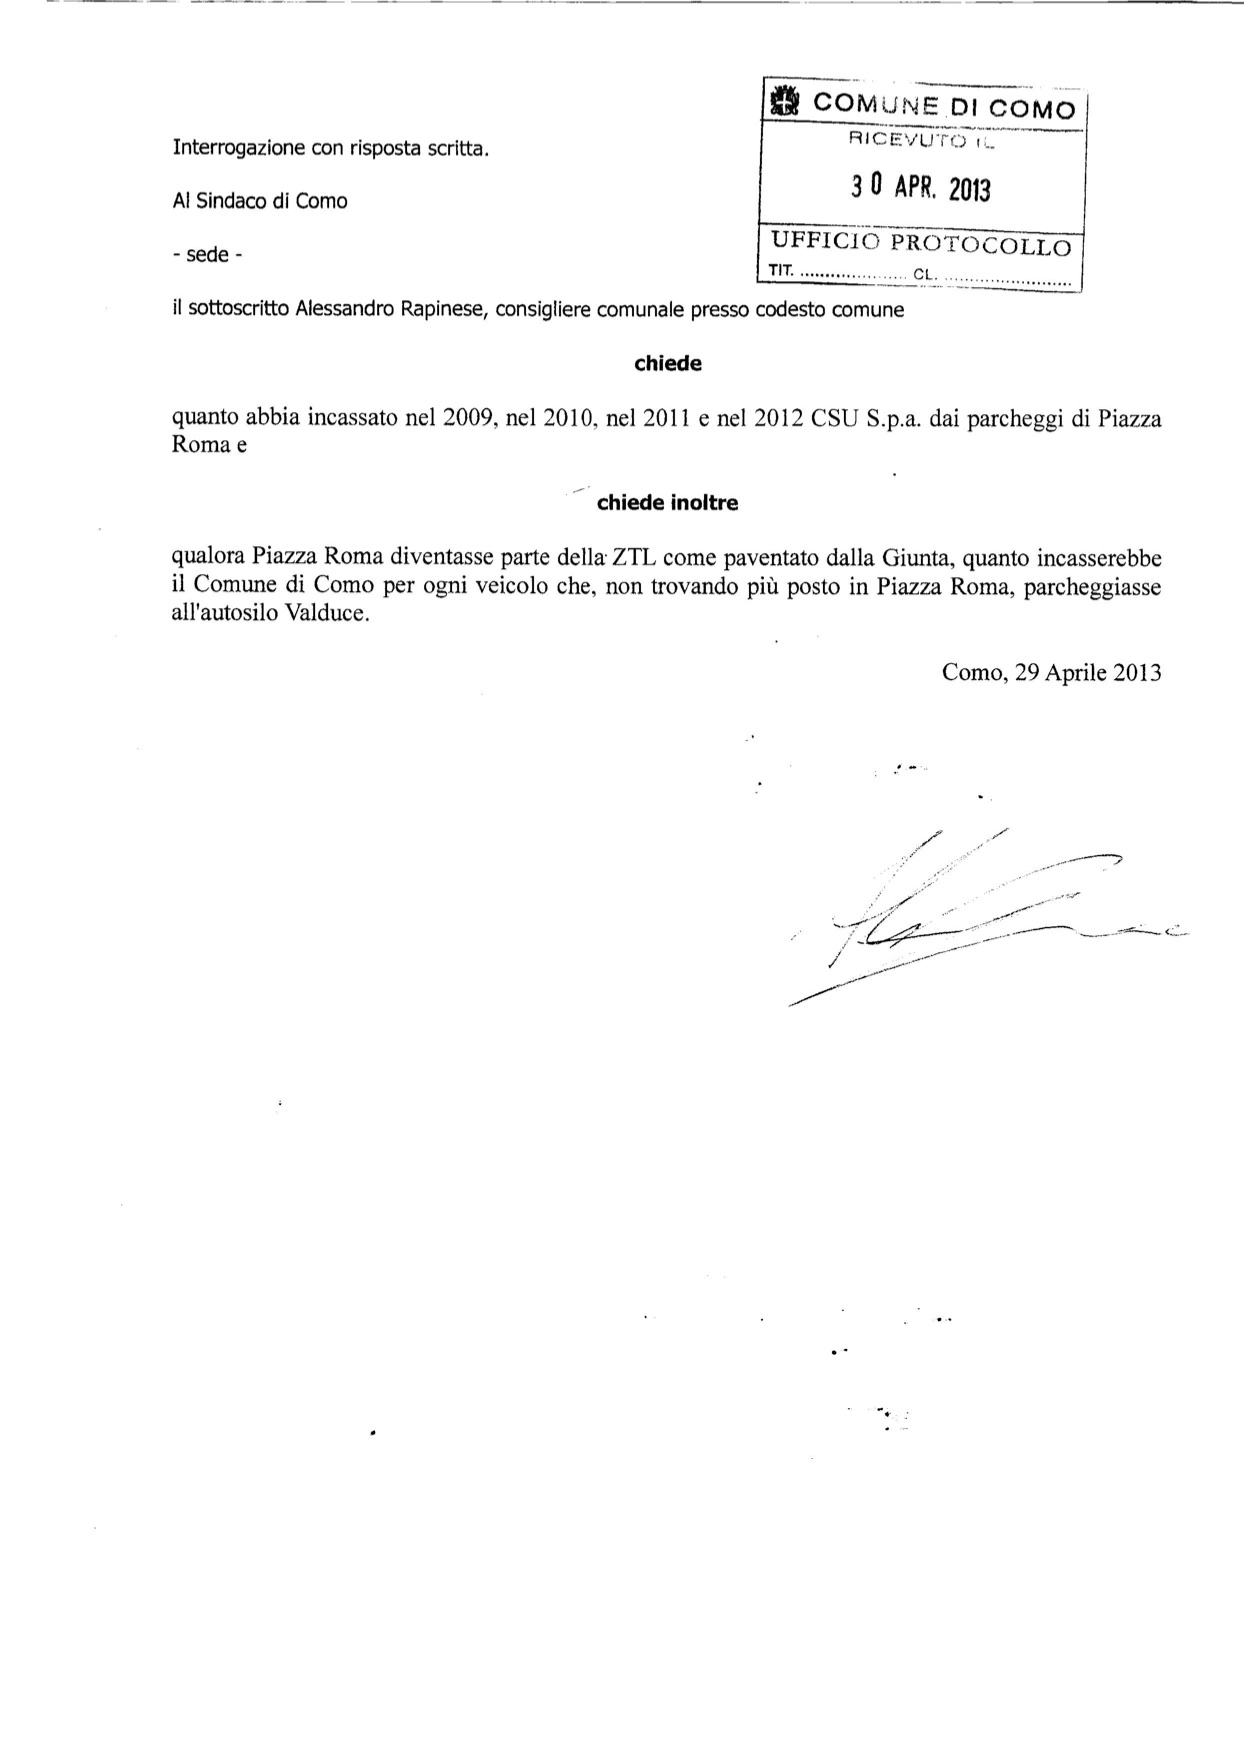 20130429-interrogazione-posti-blu-piazza-roma